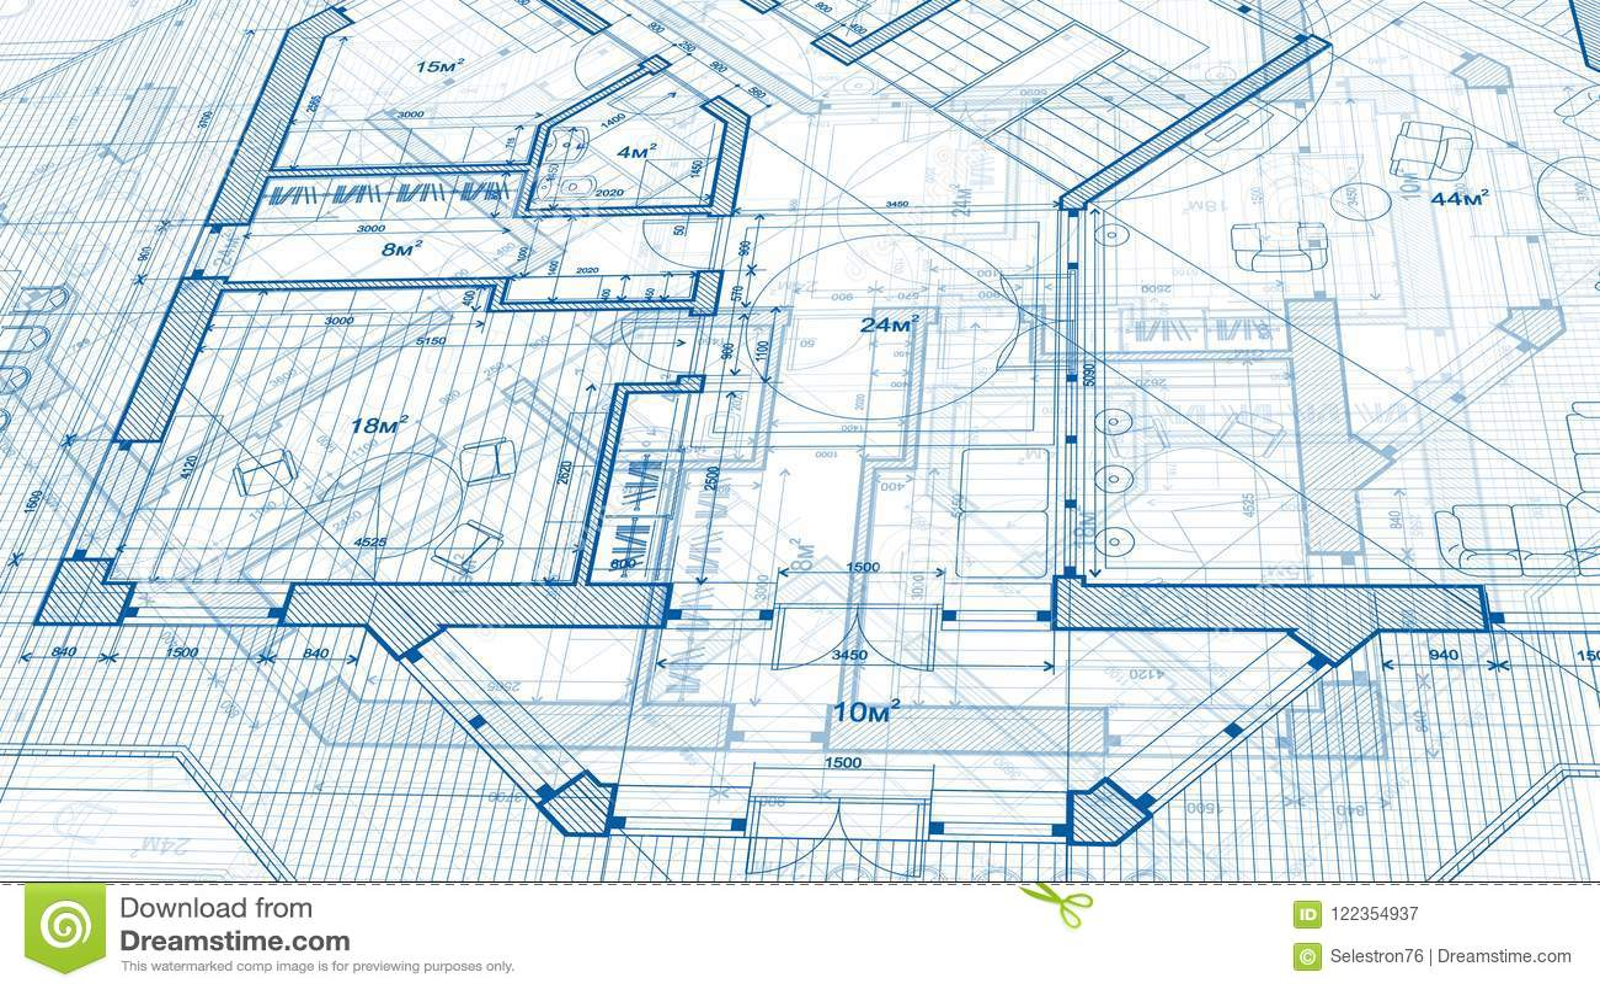 Architecture design blueprint plan illustration of a plan mod download architecture design blueprint plan illustration of a plan mod stock image image malvernweather Gallery